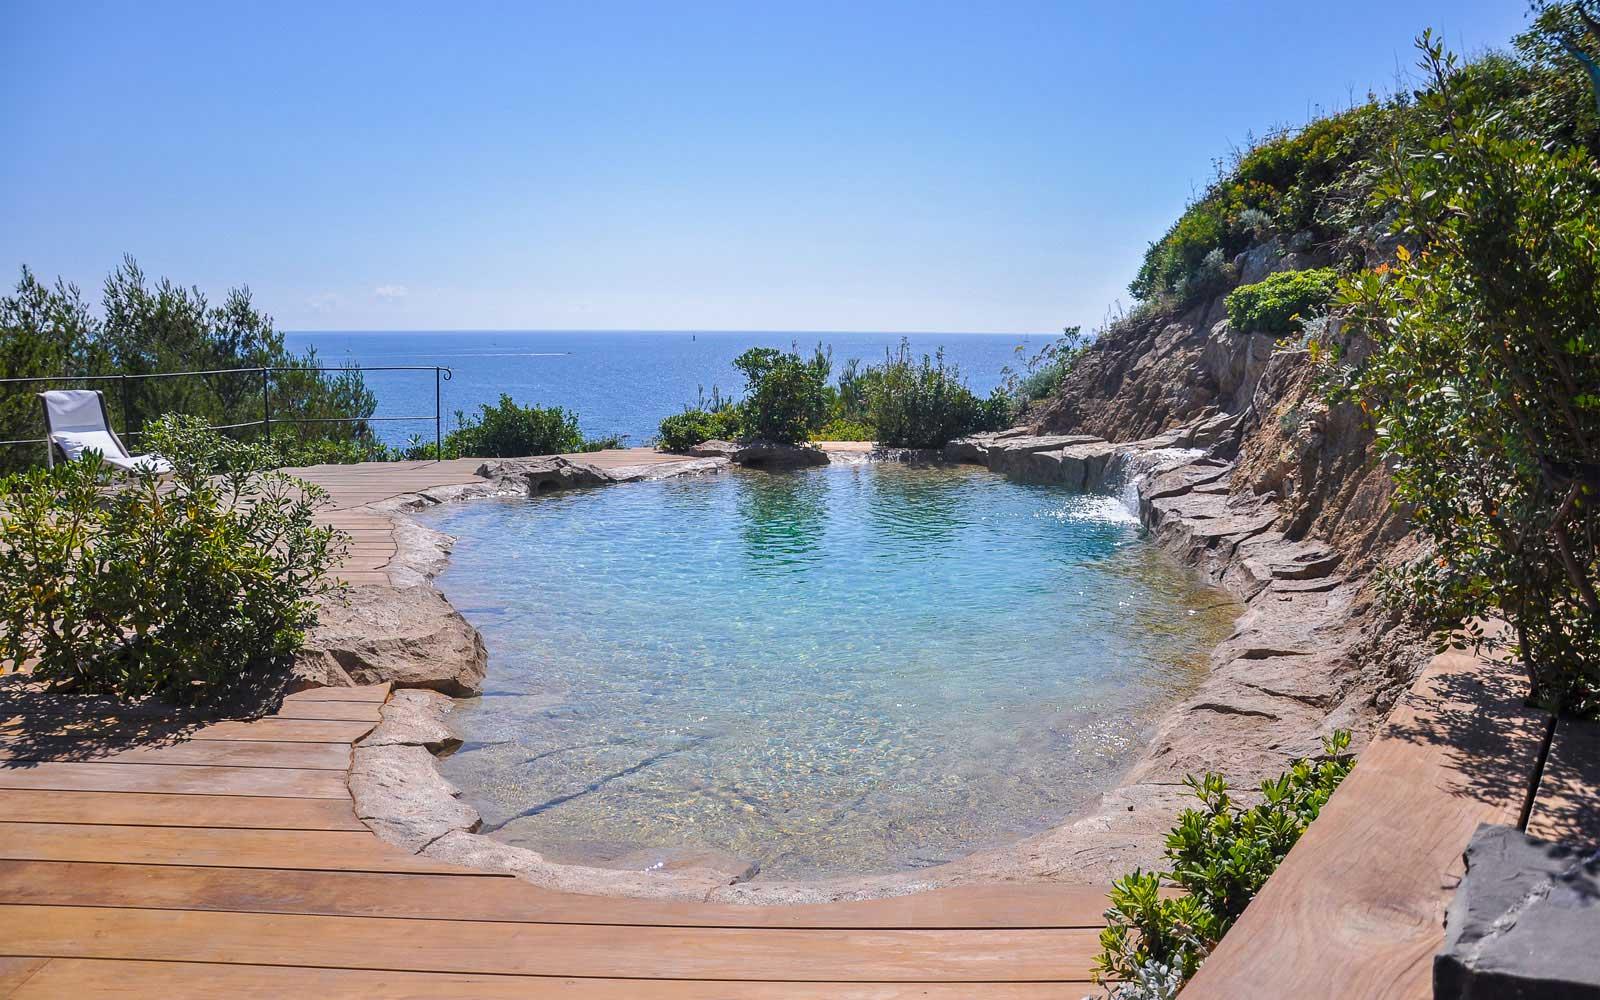 Naturalistic pool overlooking the sea